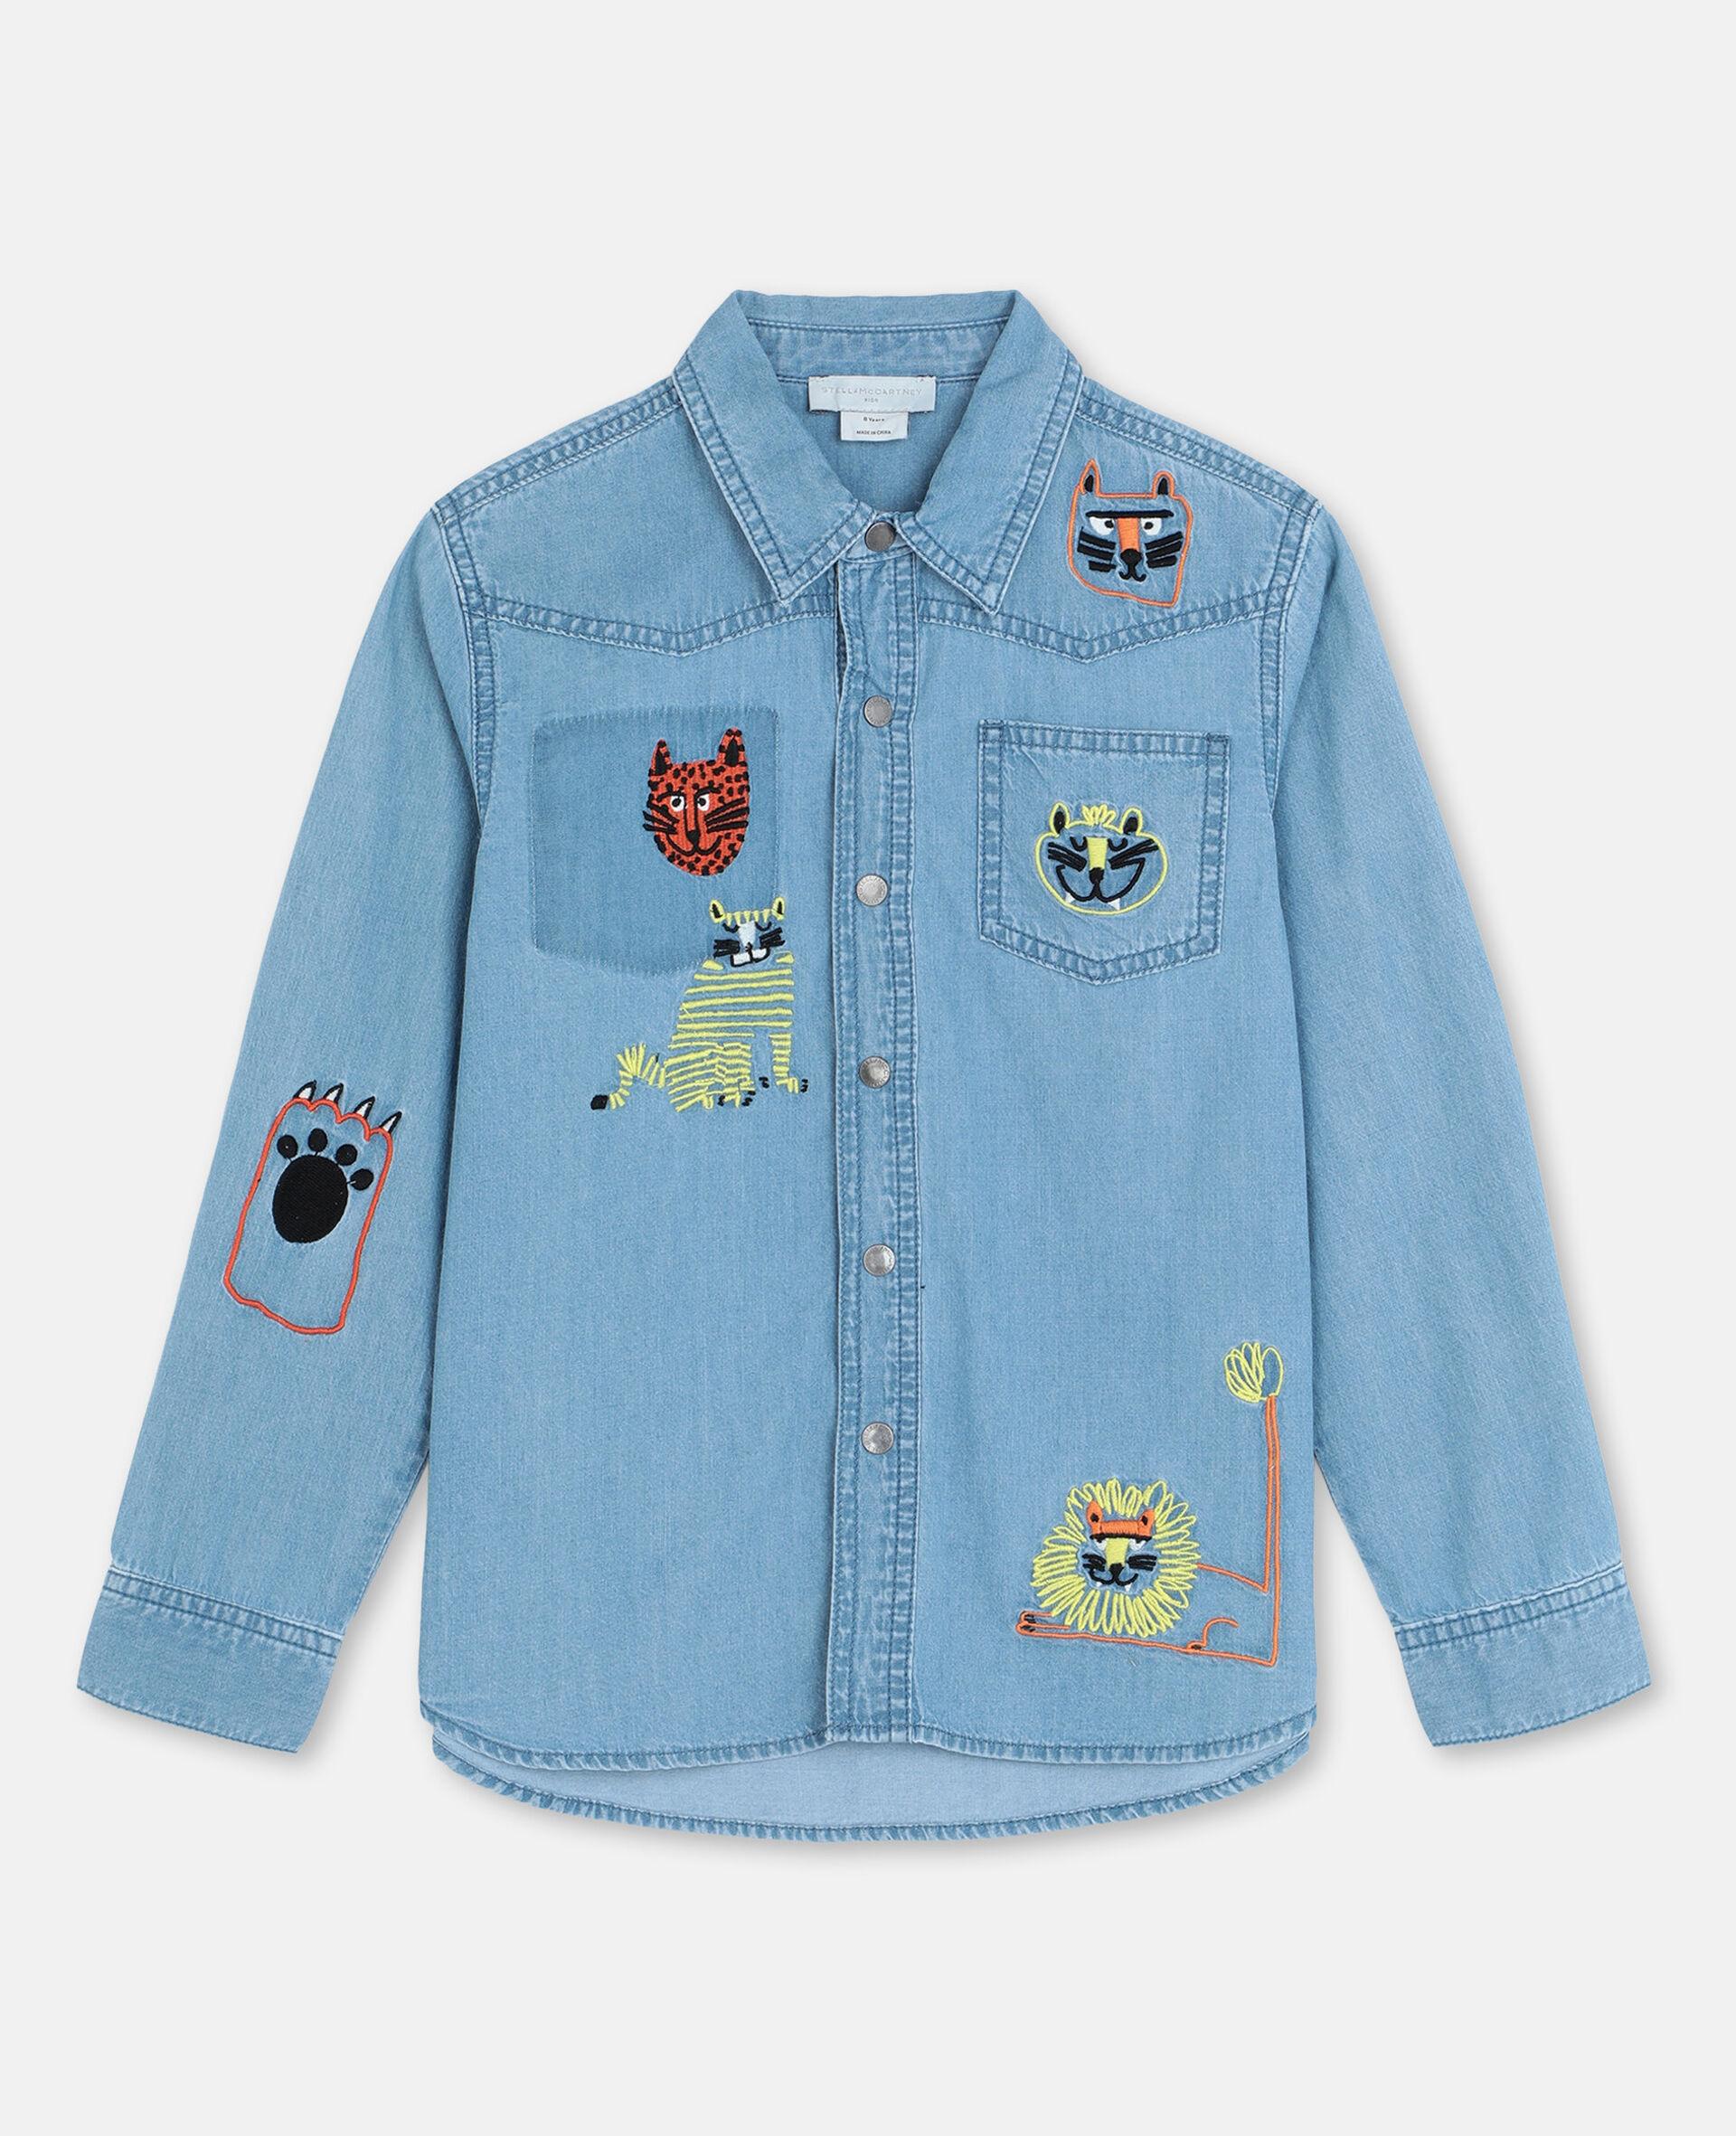 Embroidered Cats 棉质钱布雷布衬衫 -蓝色-large image number 0